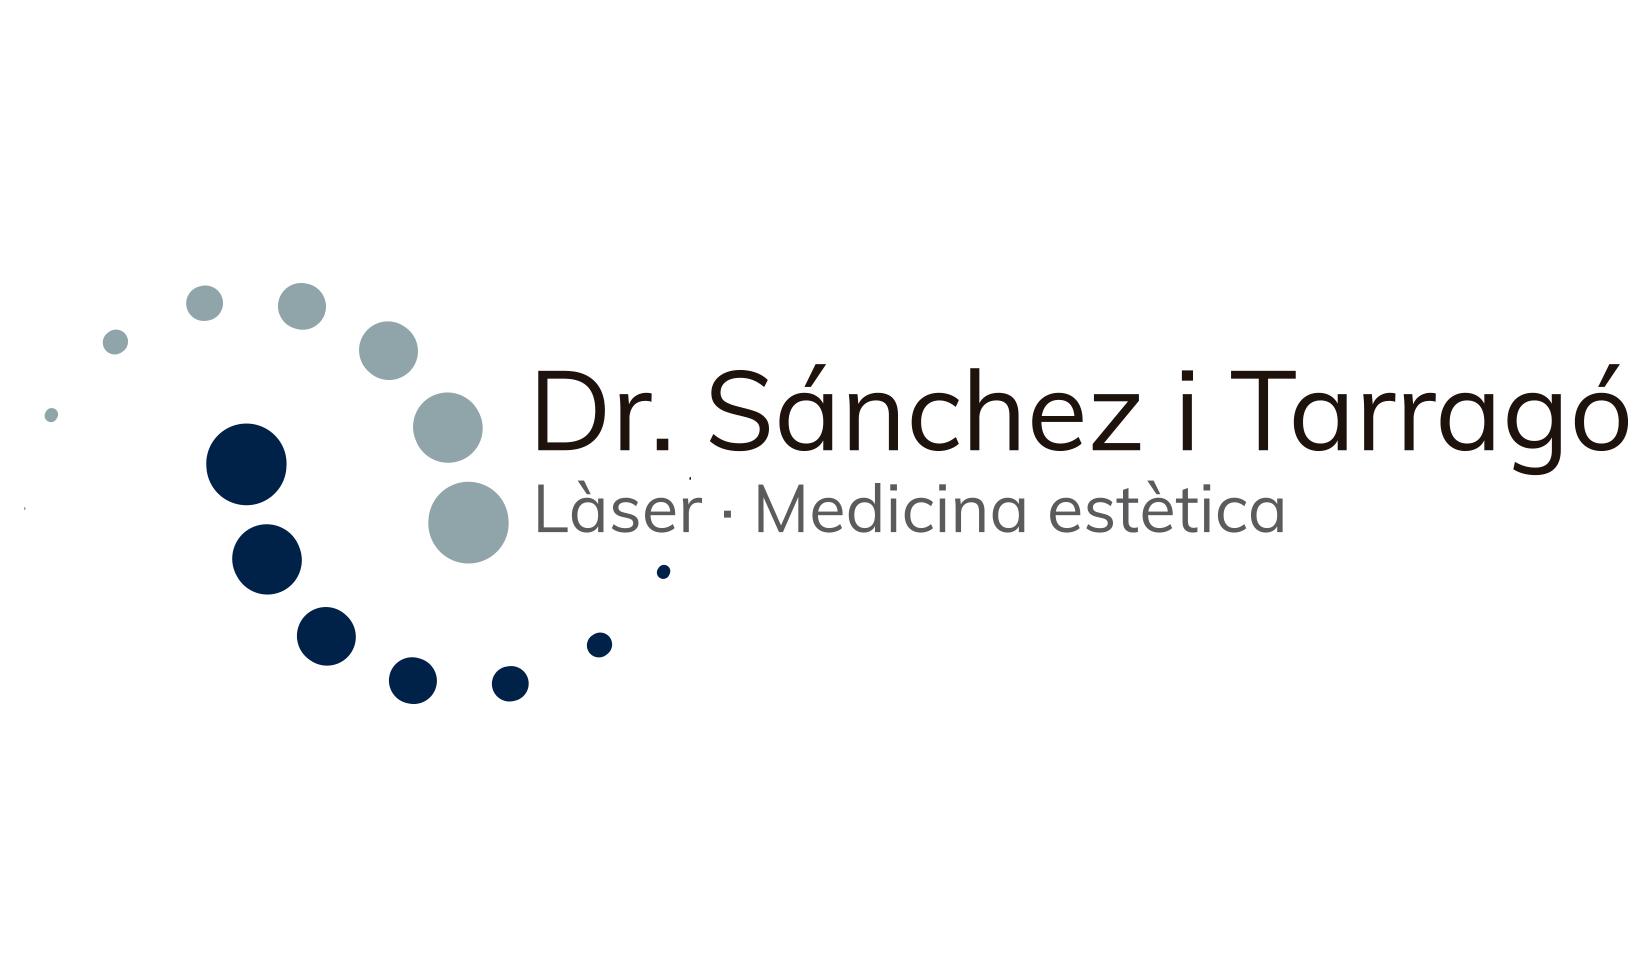 Dr. Xavier Sánchez i Tarragó